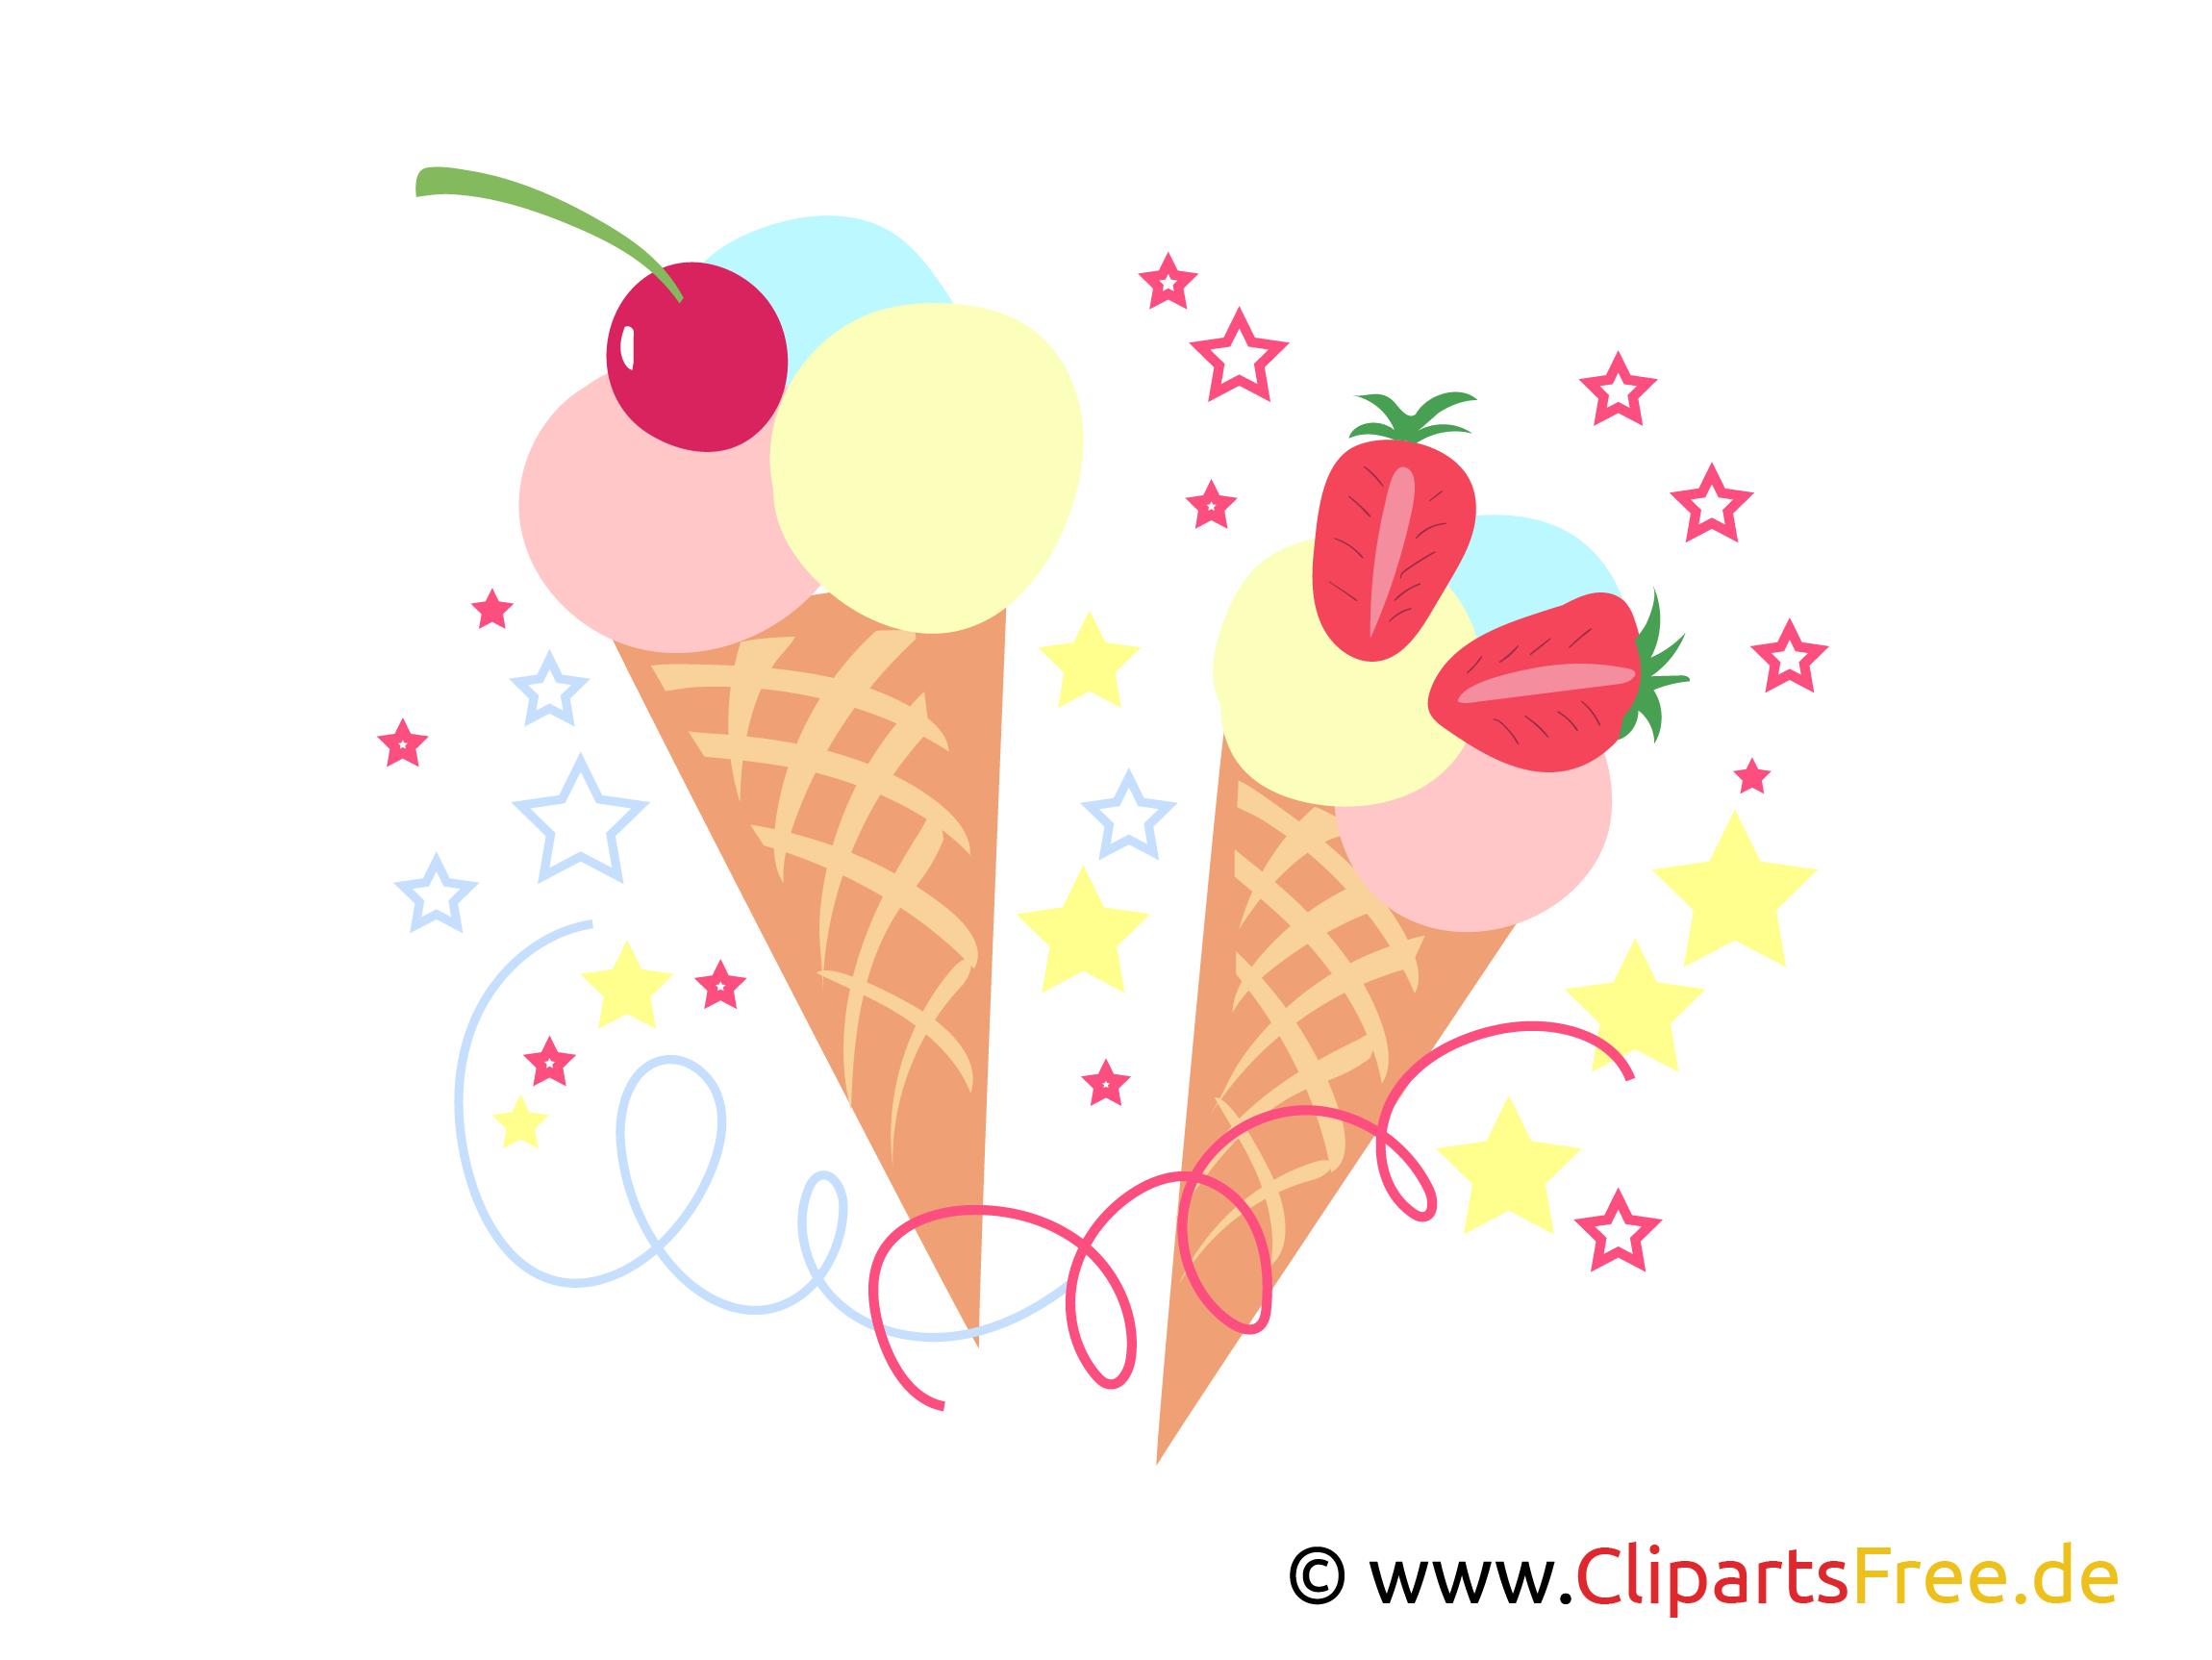 Eis Clipart, Grafik, E-Karte, Bild zum Geburtstag